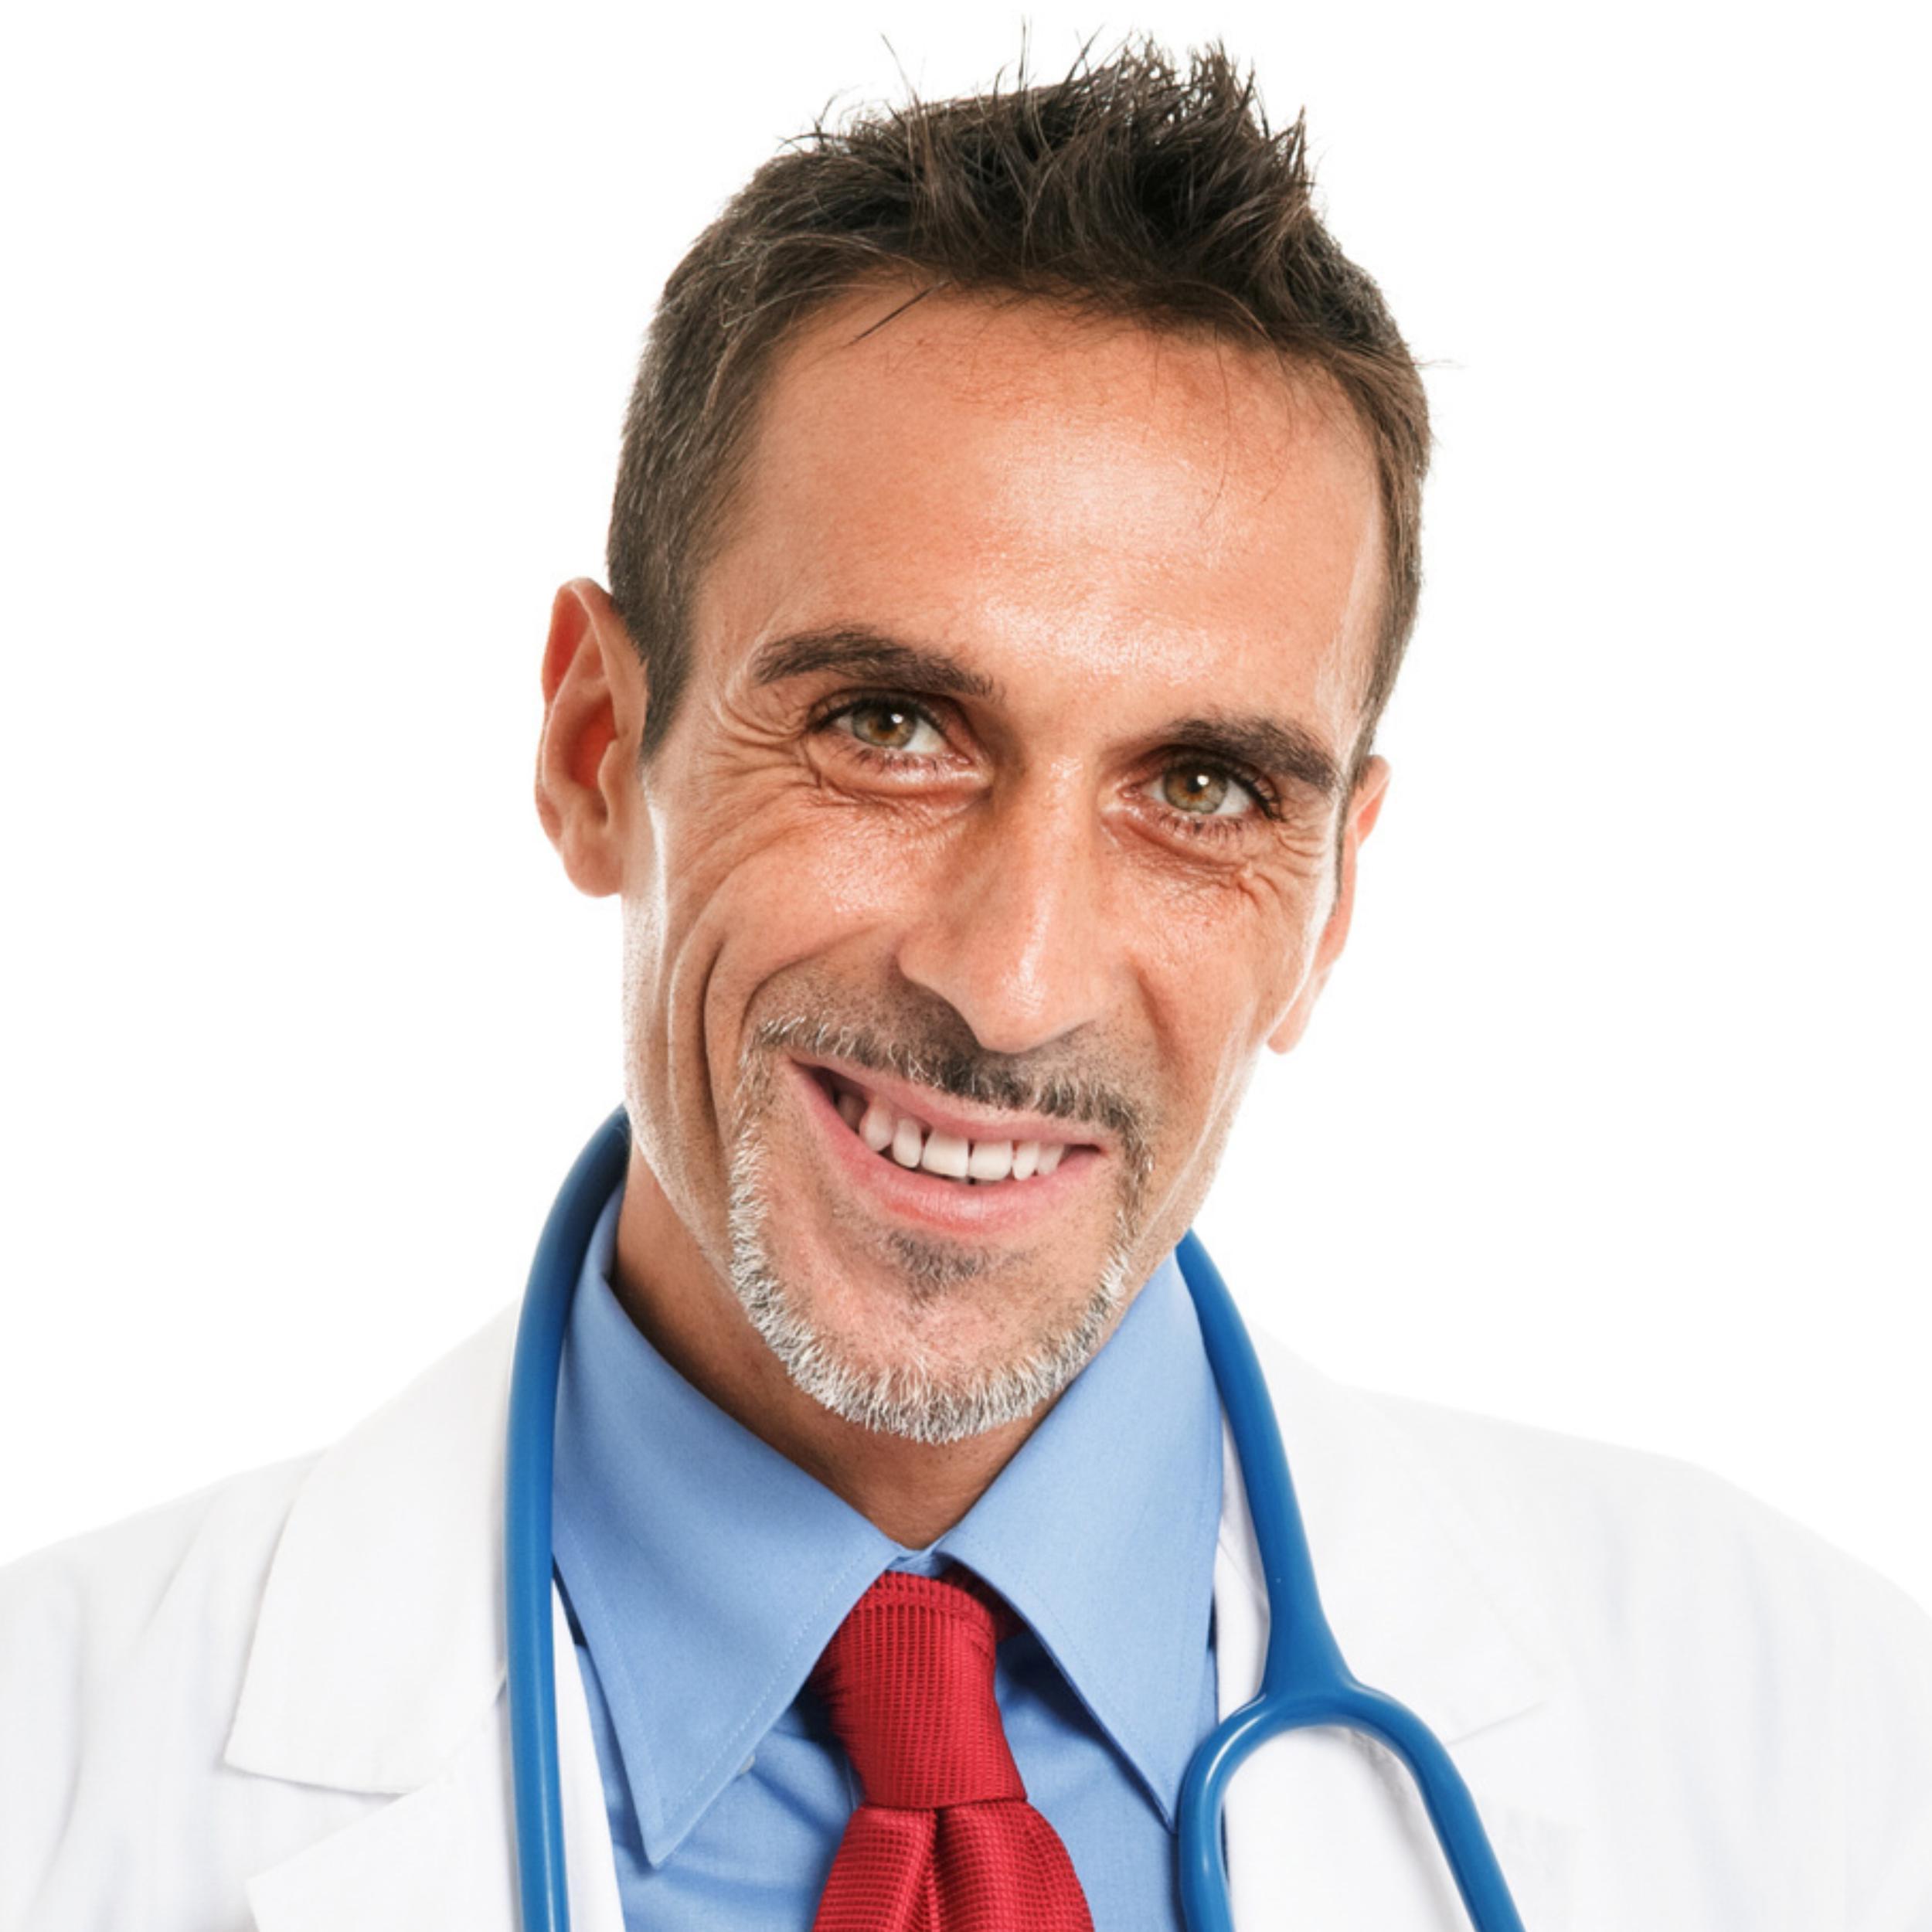 6e78aa3a-9989-11e7-a70a-0242ac110002-Medical_18.jpg